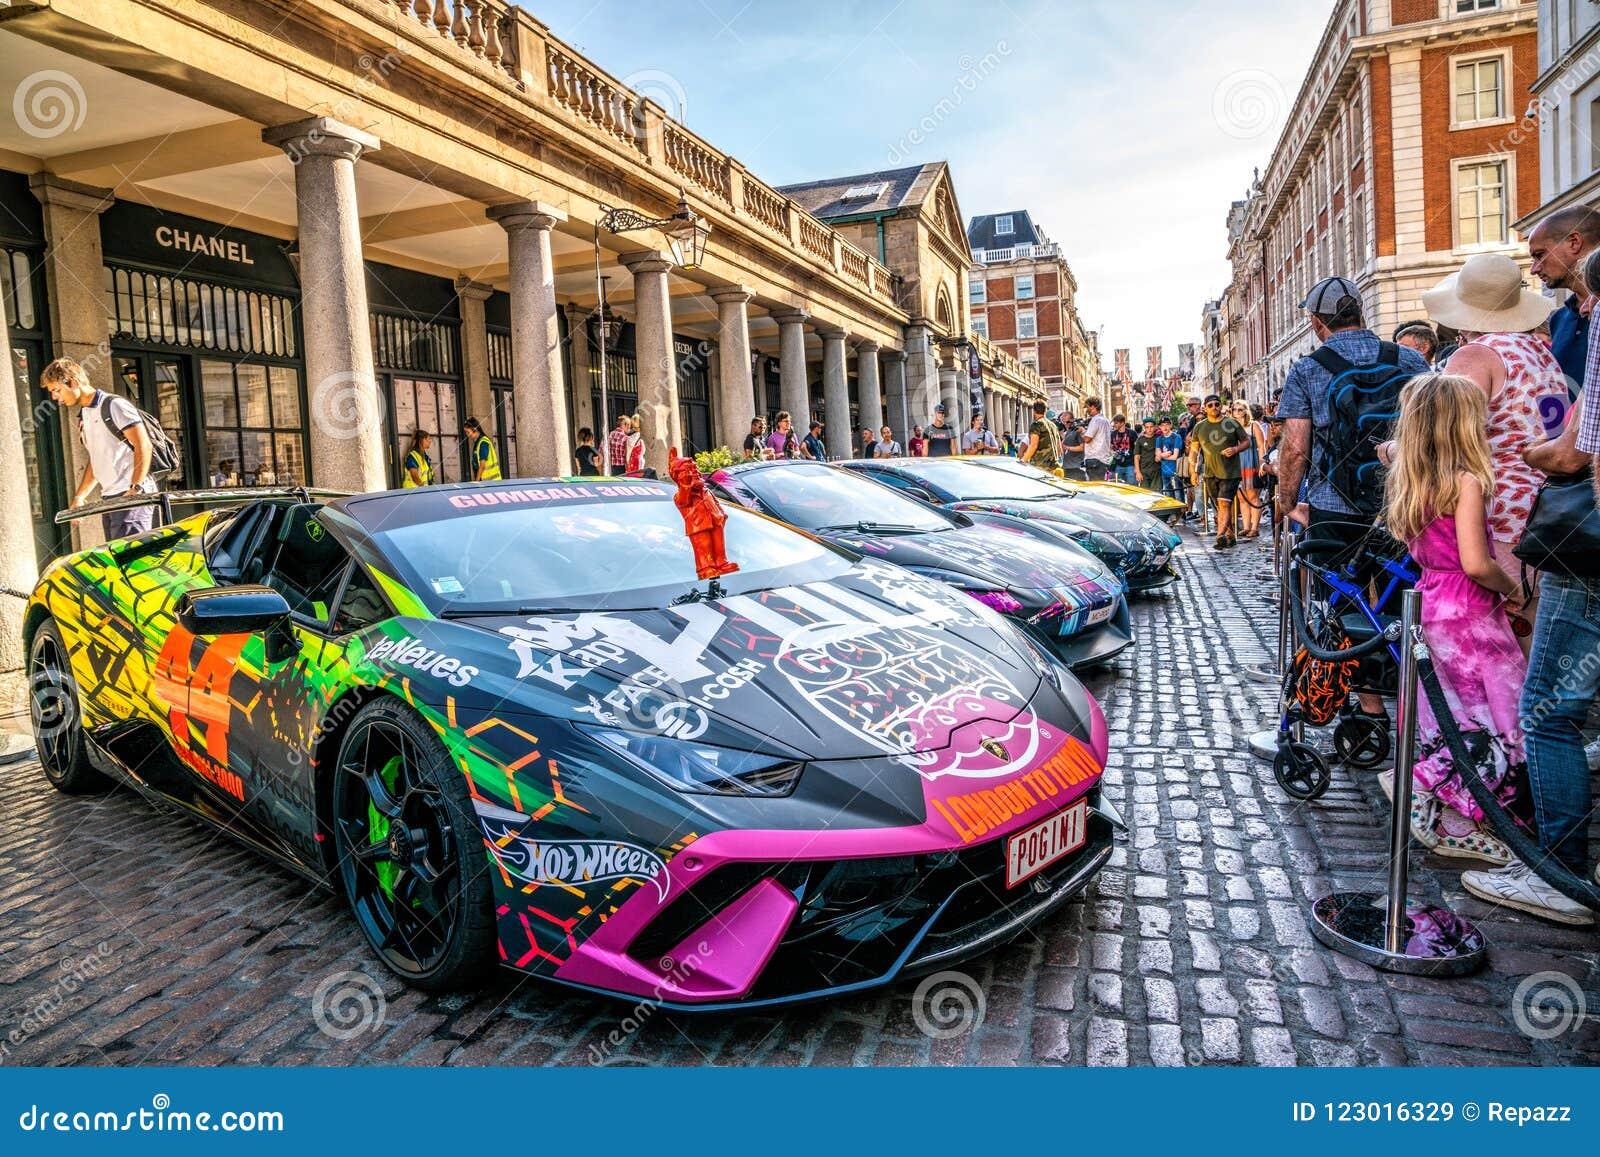 Supercar Lamborghini Aventador in London